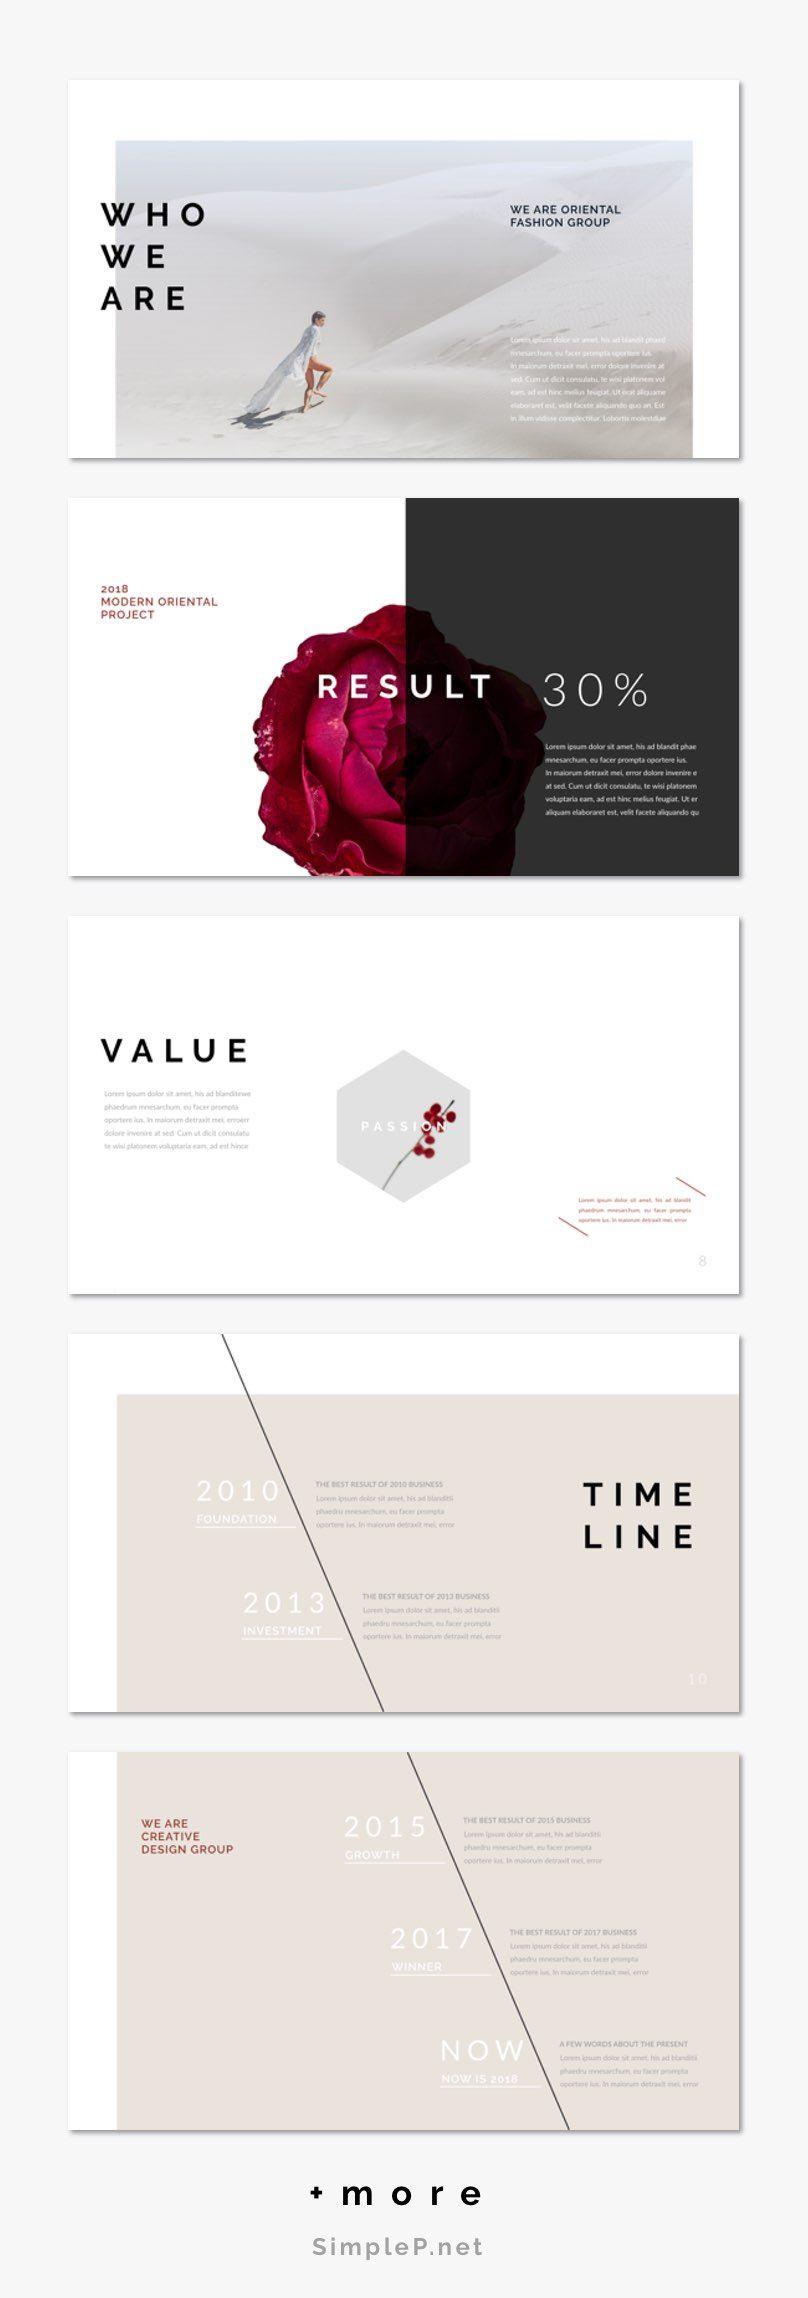 Fashion Business Powerpoint Presentation Template #oriental